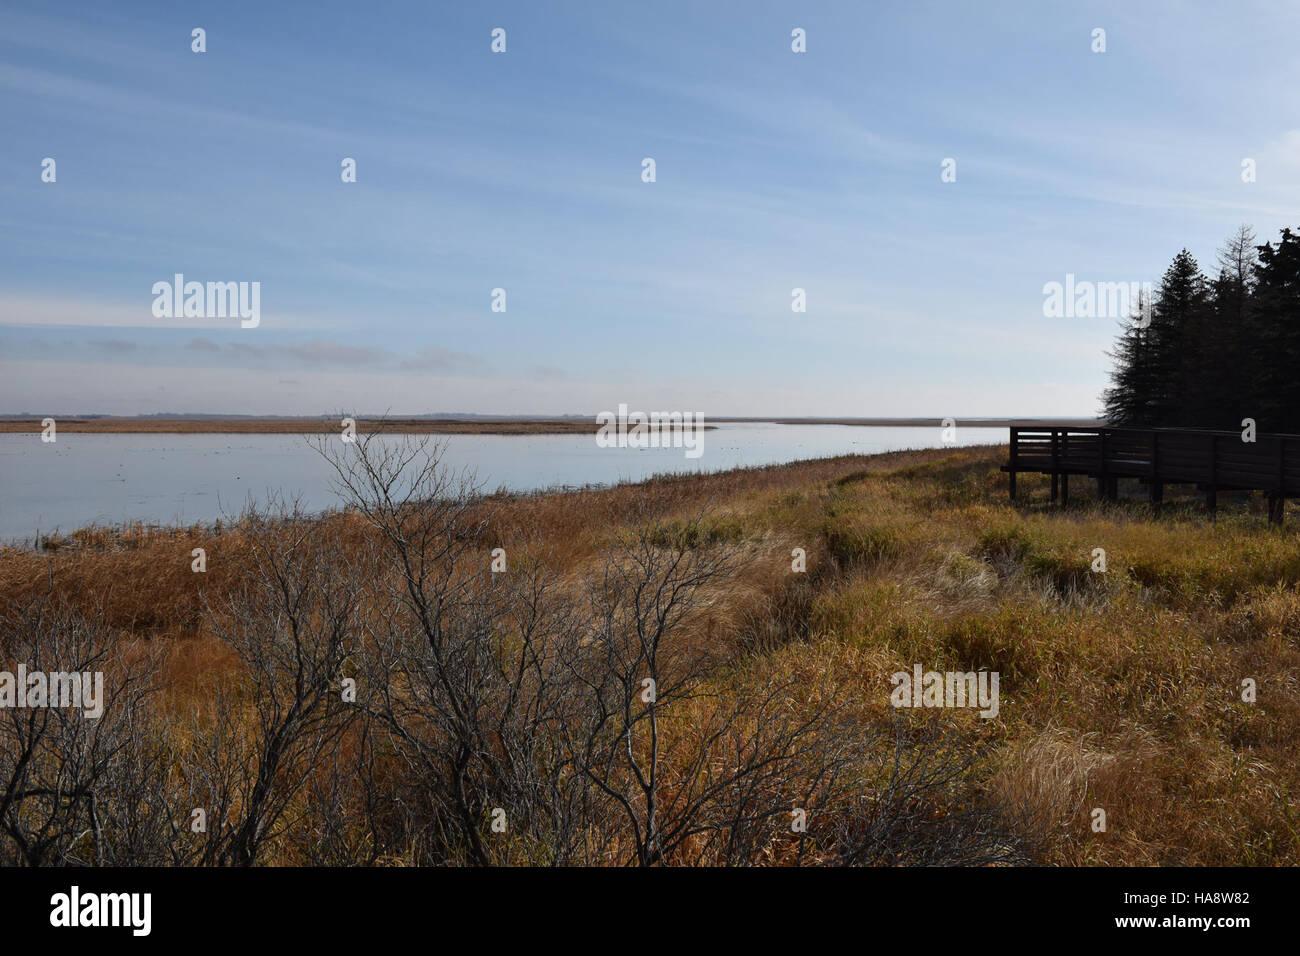 usfwsmtnprairie 15725296021 Beautiful Day at J. Clark Salyer NWR - Stock Image